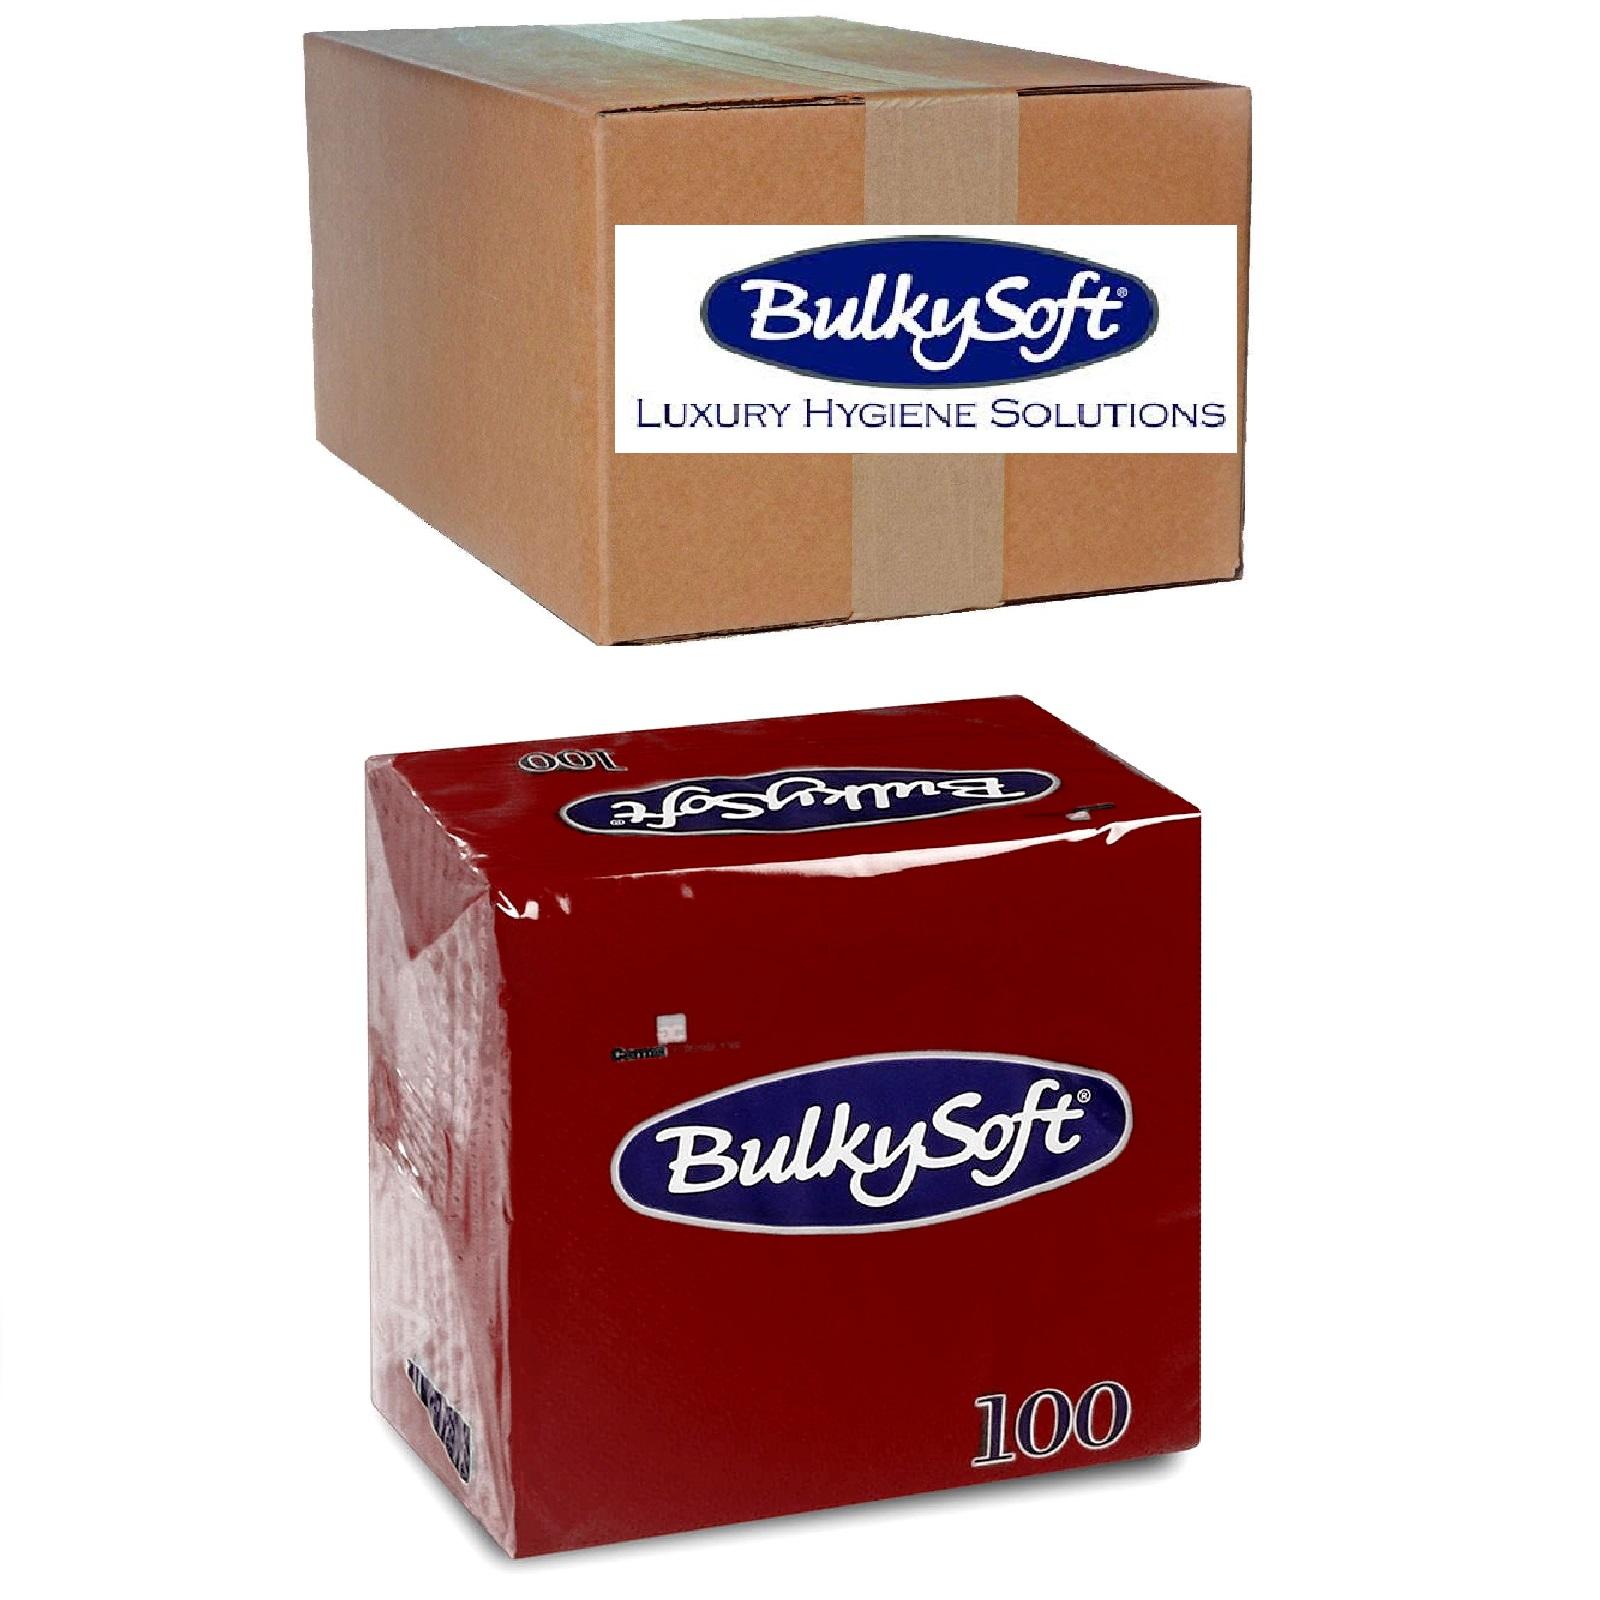 BulkySoft Servietten 1/4 Falz, bordeaux 2-lg, Zell. 24 x 24 cm, 30 x 100 Stk.